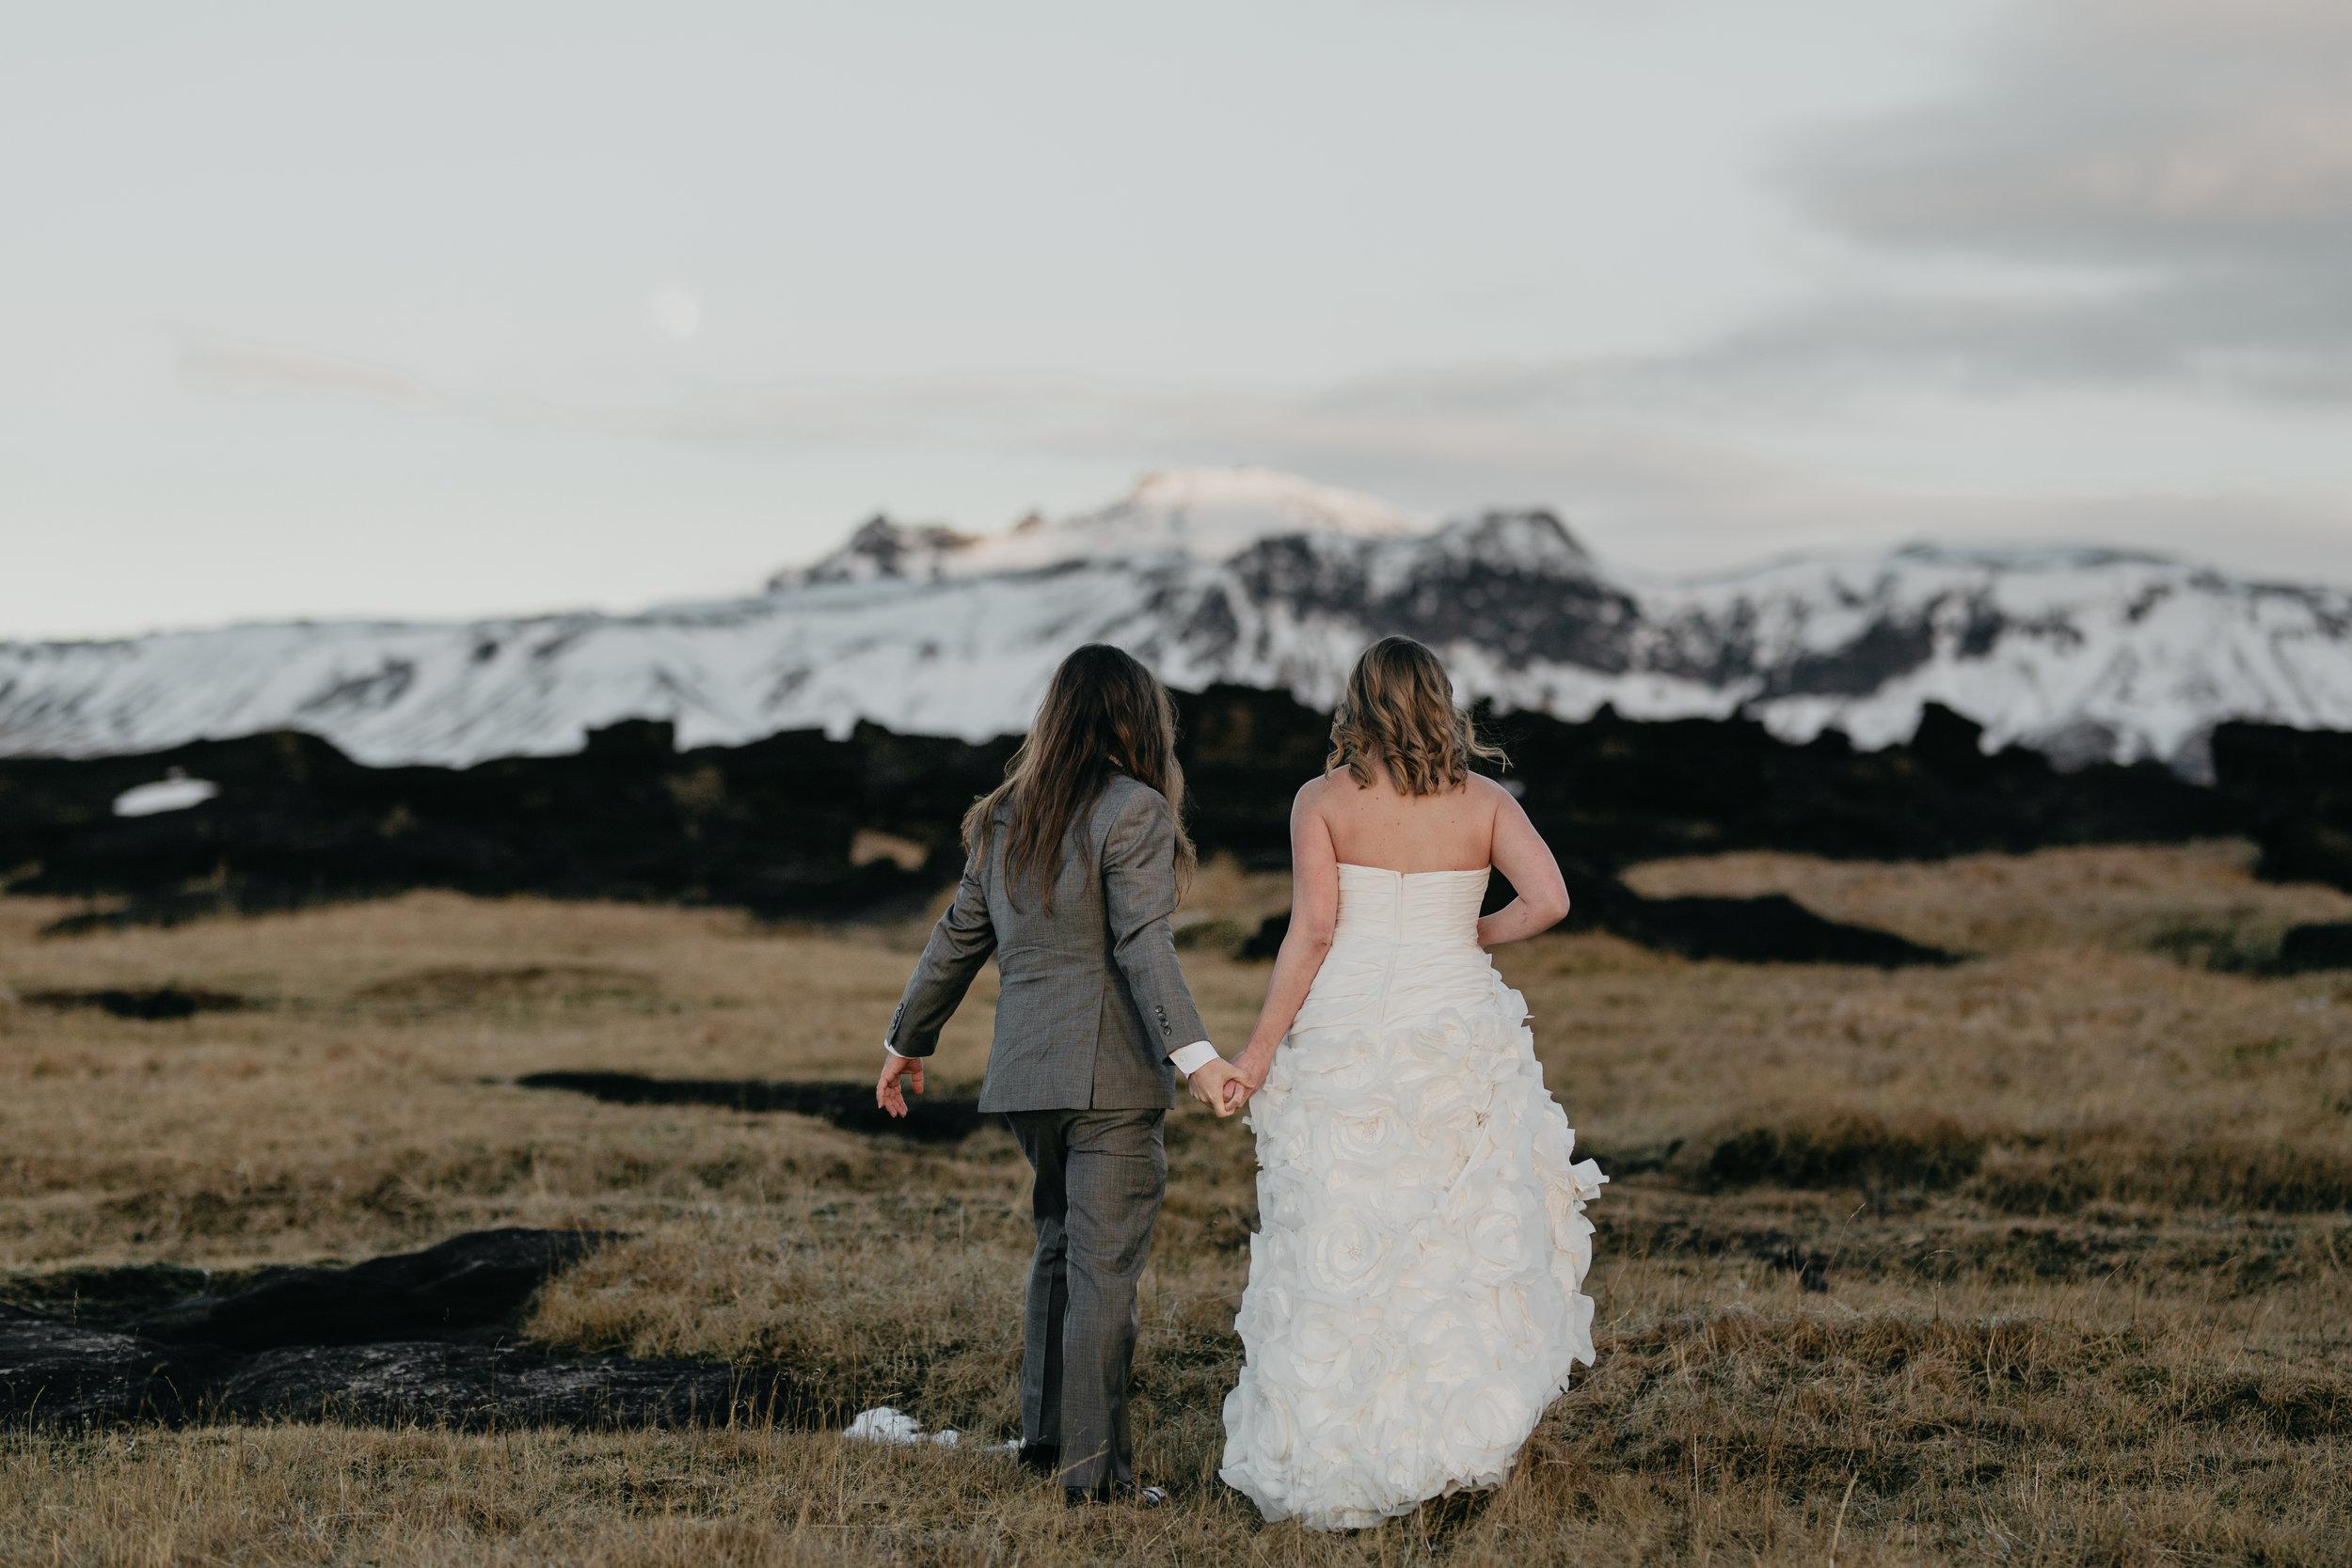 nicole-daacke-photography-iceland-winter-sunset-adventure-elopement-skogafoss-waterfall-black-sand-beach-dyrholaey-vik-iceland-intimate-wedding-black-church-elopement-photographer-22.jpg